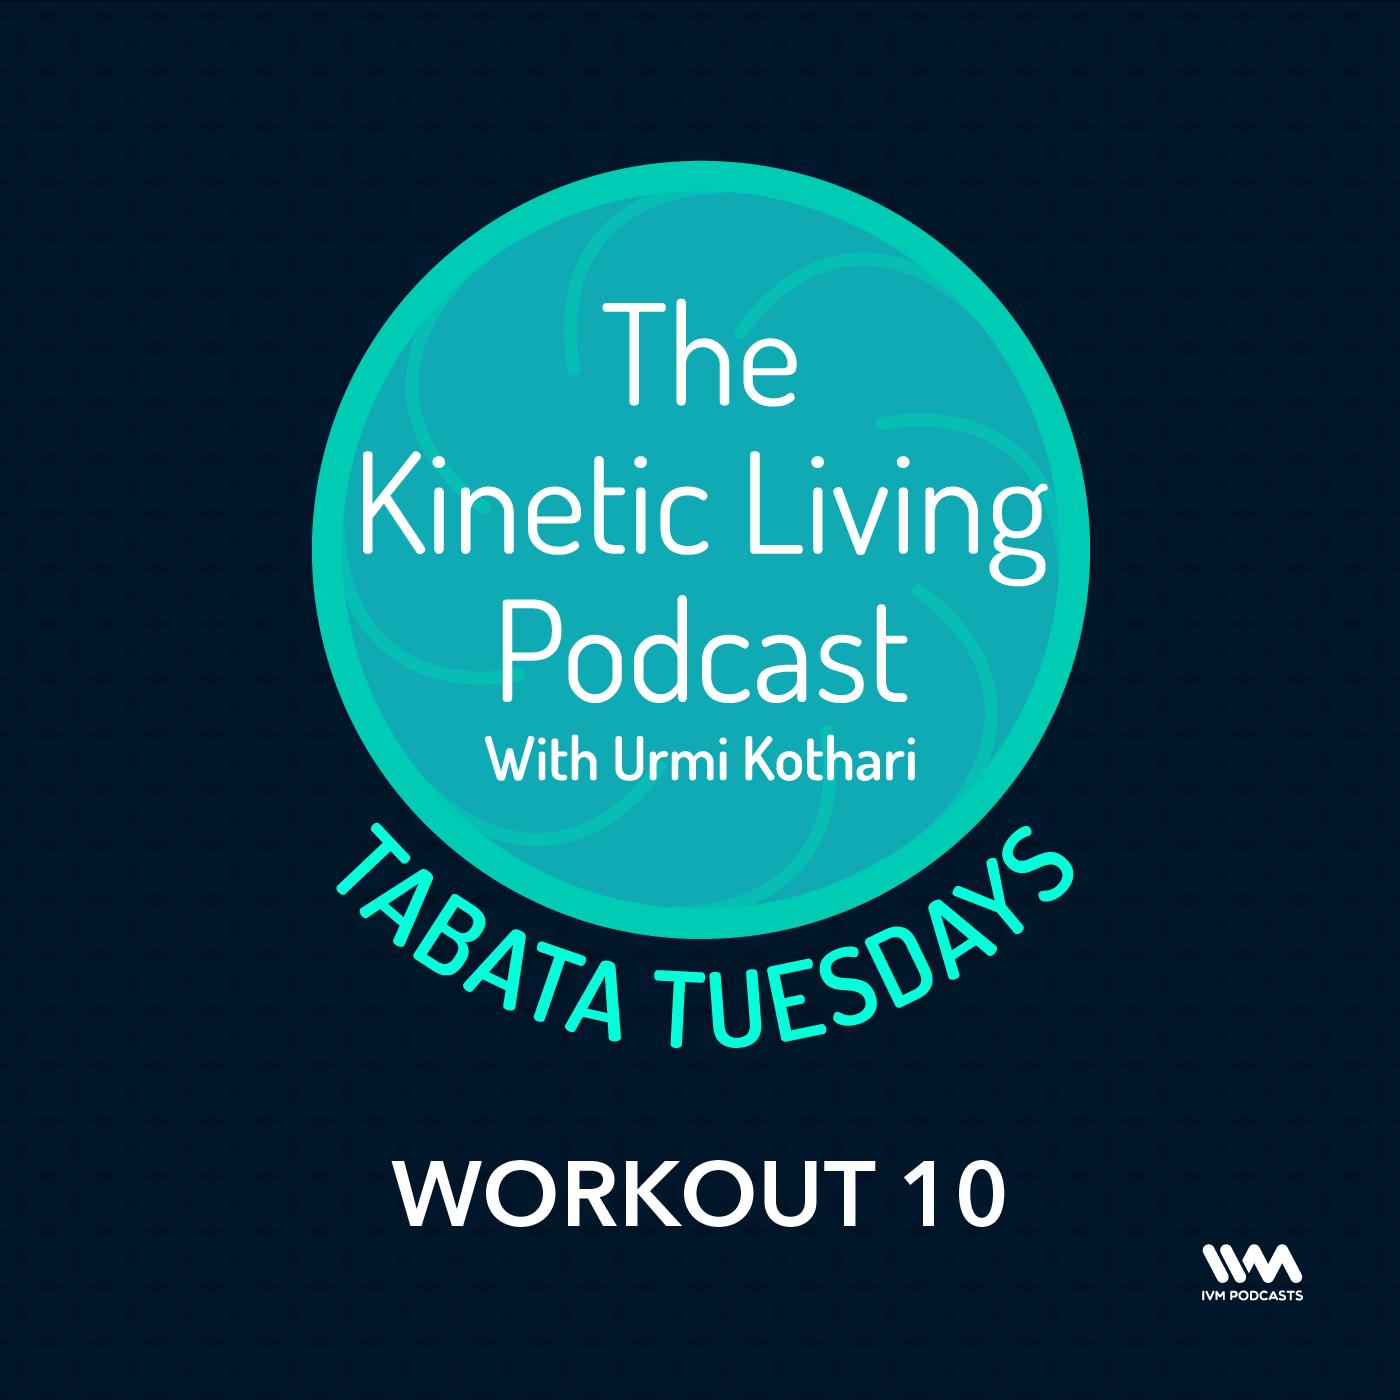 S02 E10: Tabata Tuesday - Workout 10